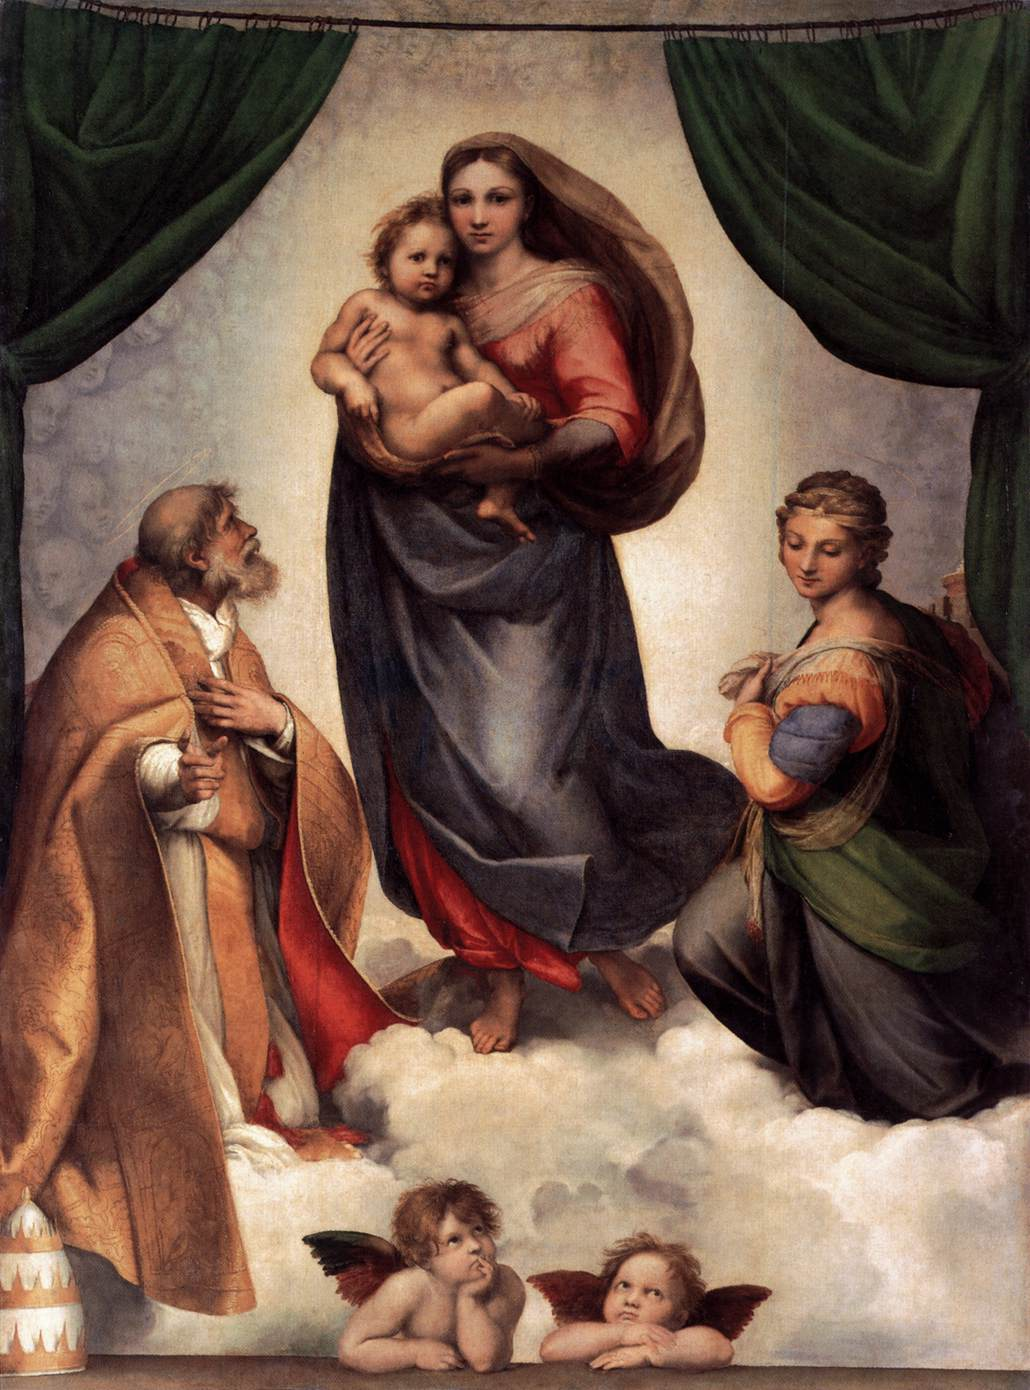 Rafael, De Sixtijnse Madonna, 1513-14, Gemäldegalerie, Dresden